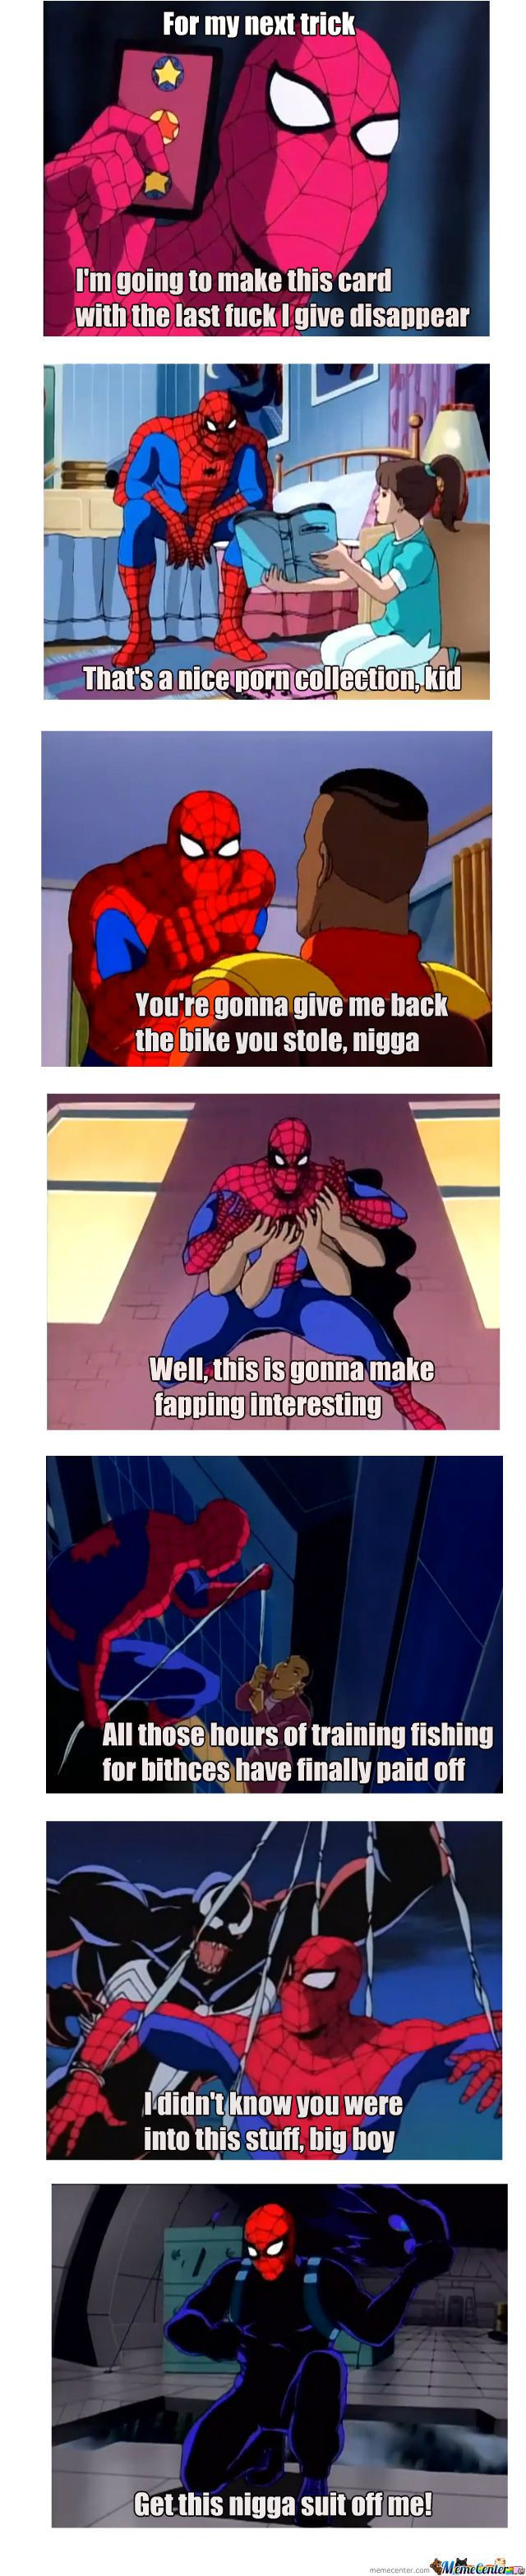 the spectacular spider-man meme | 90's Spider-Man 60's Style - Meme Center